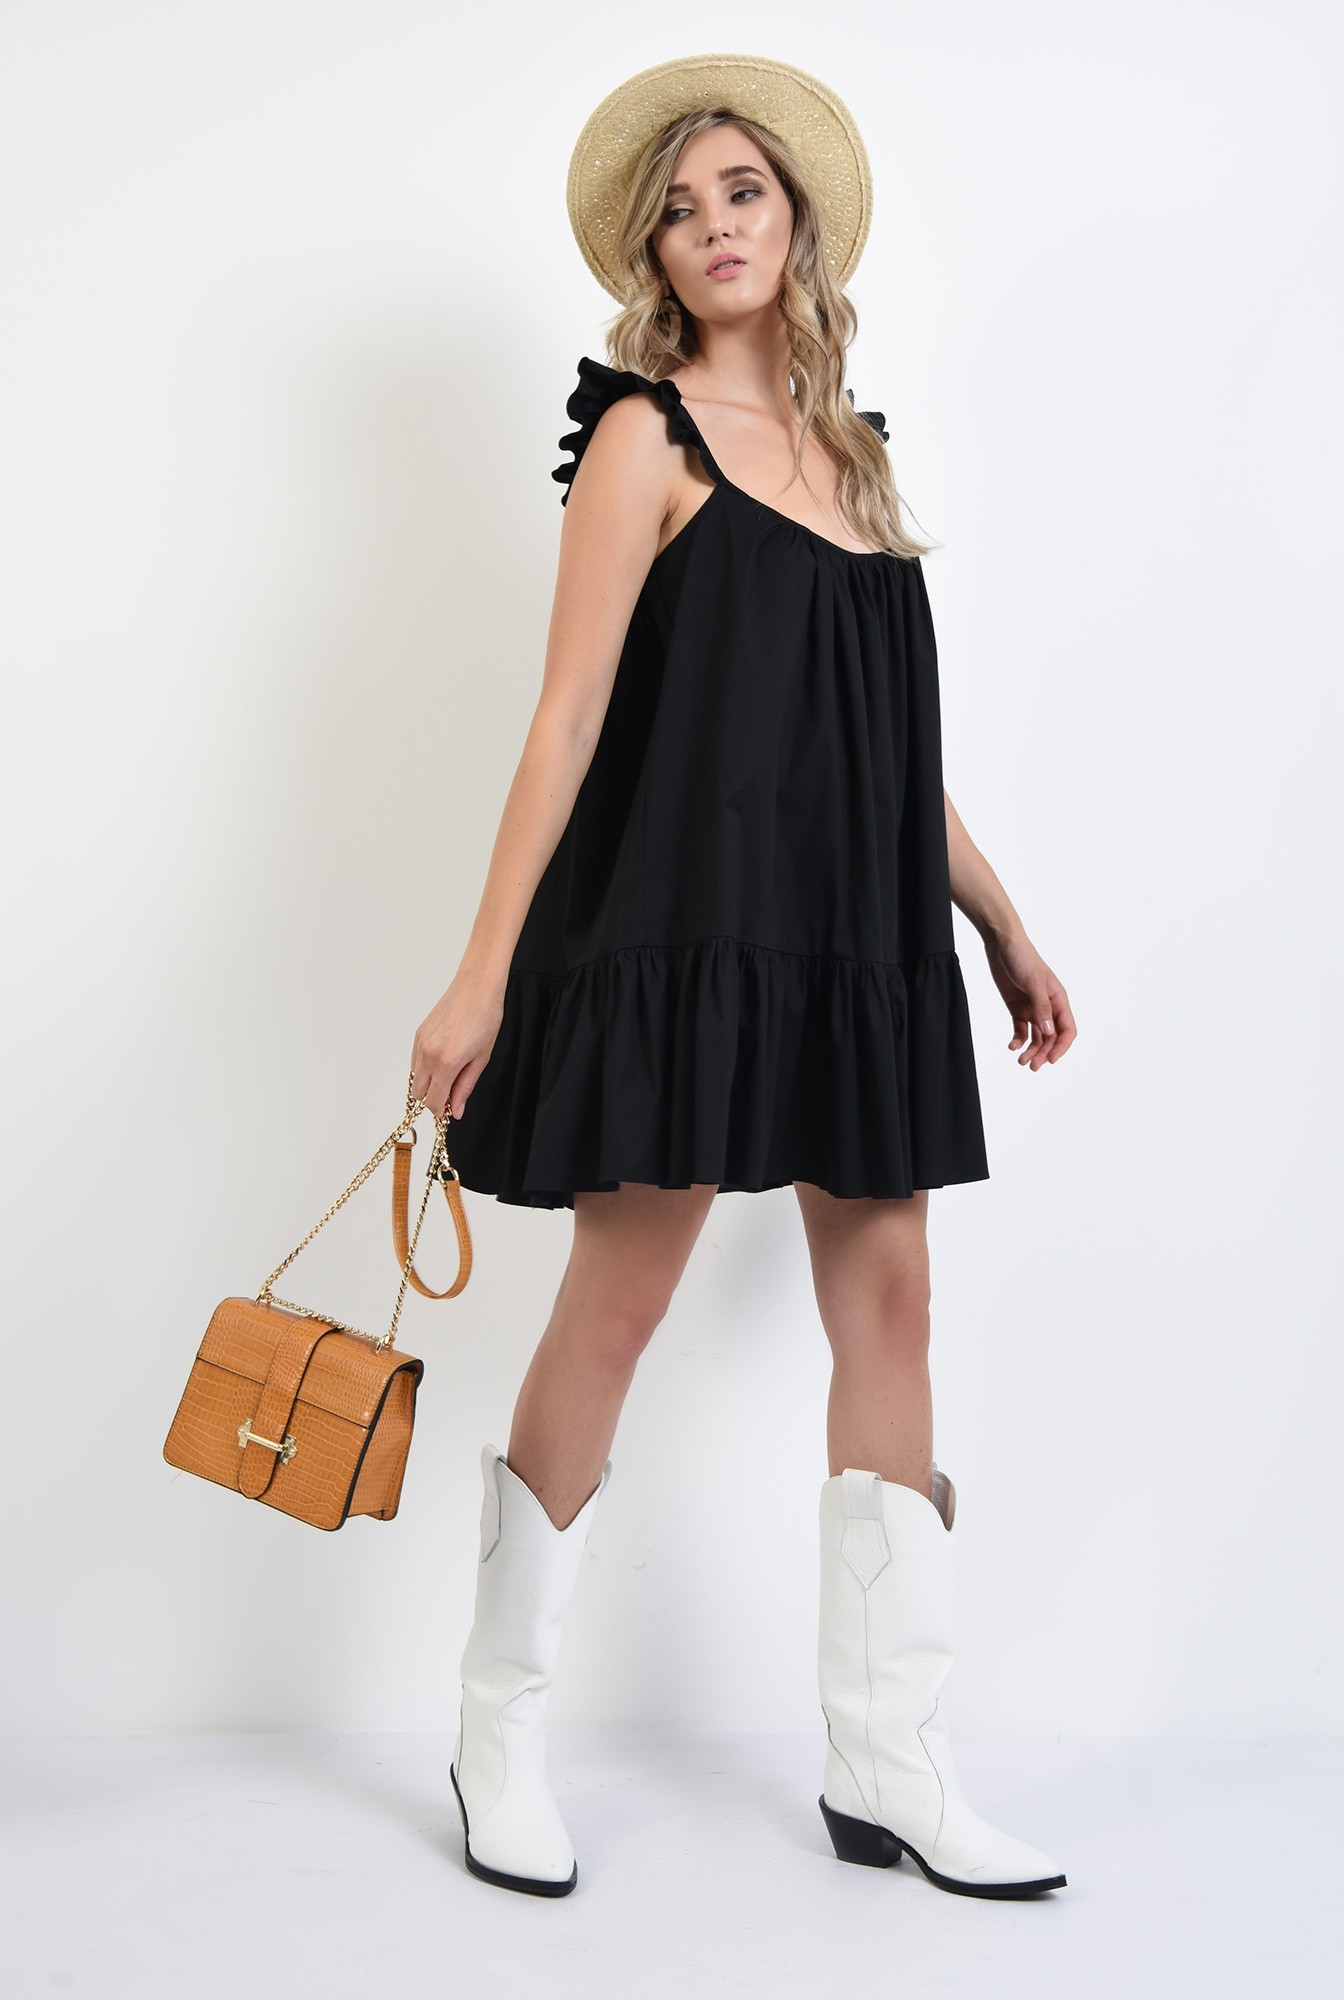 3 - rochie neagra, mini, evazata, cu volan la baza, cu bretele, bumbac